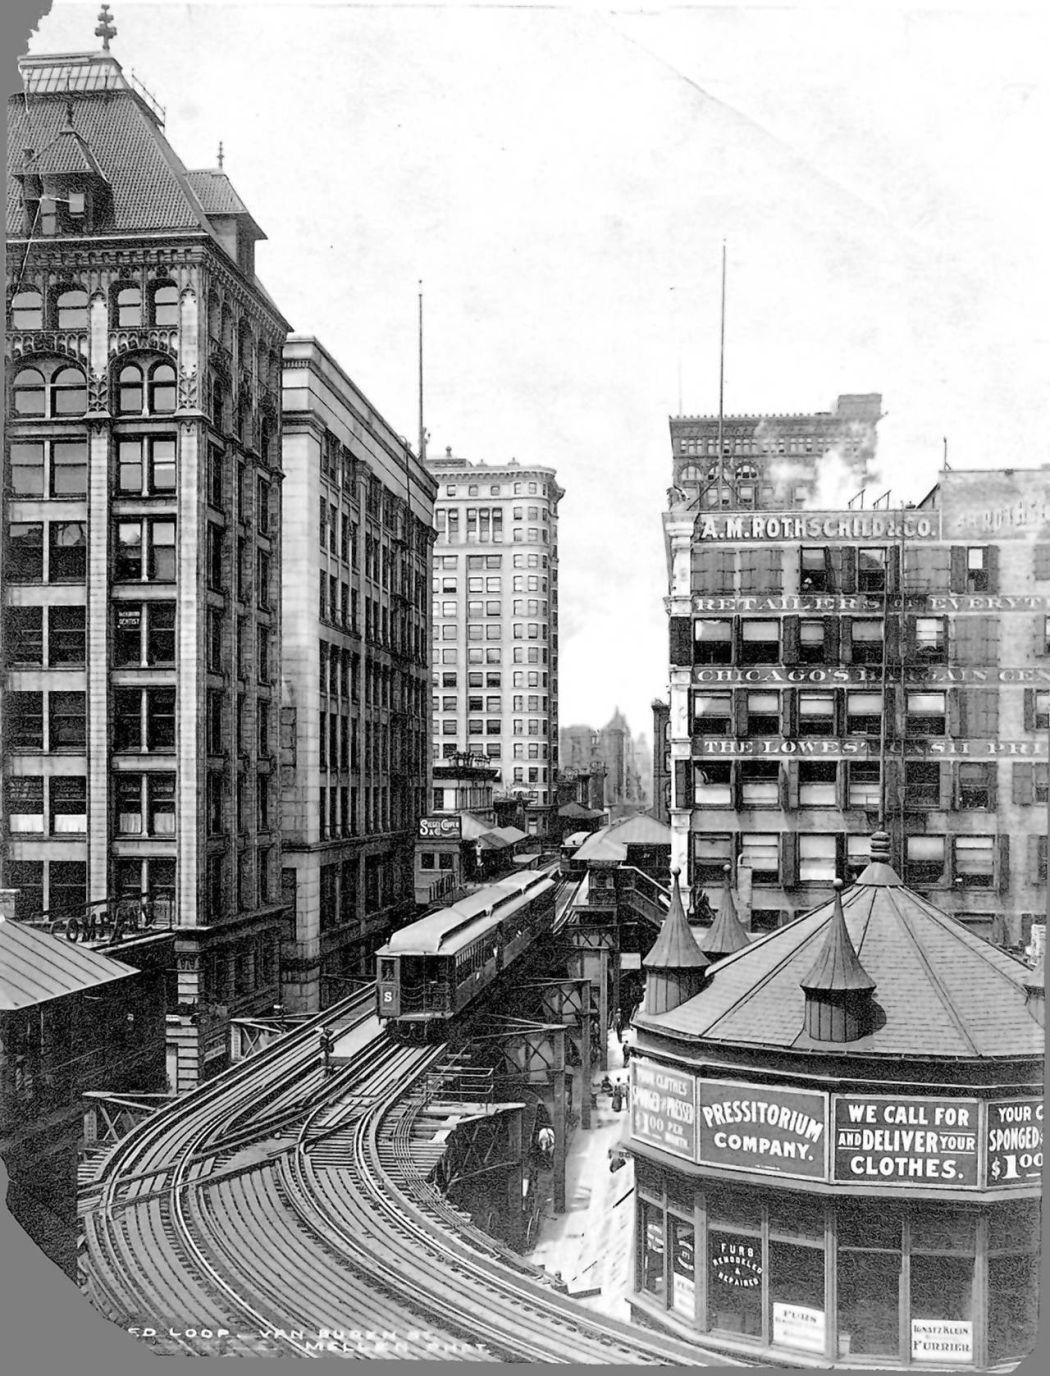 chicago-L-train-line-1900s-07